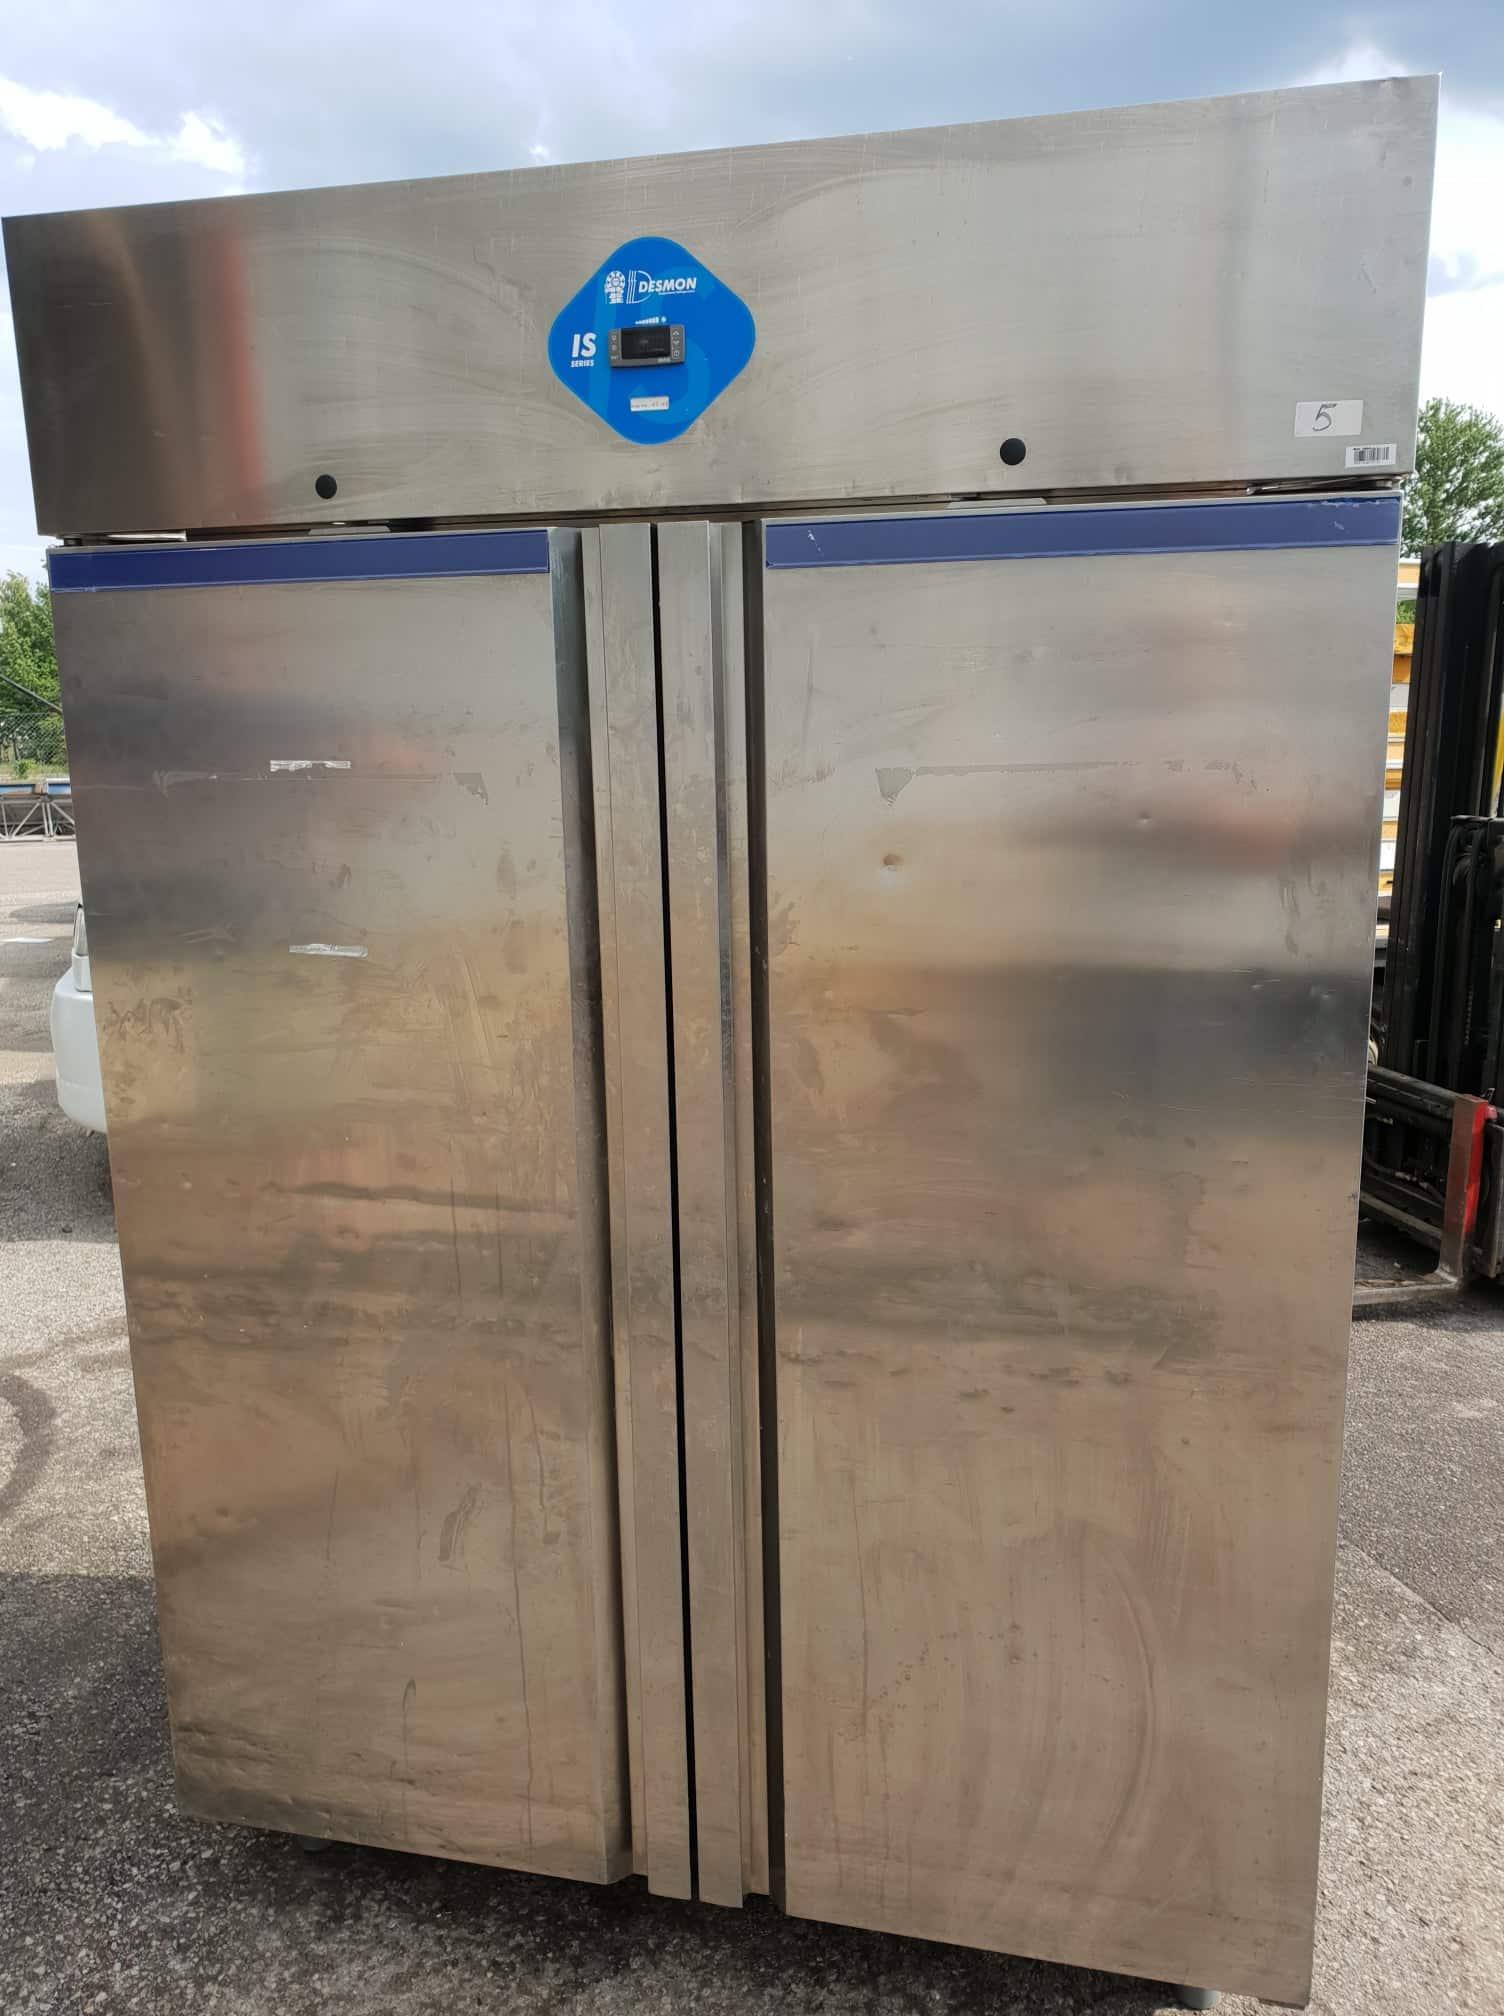 6c6cbfbf454 RST külmik Desmon ISM14 S/S - Kreutz OÜ - Külmseadmed ja ...